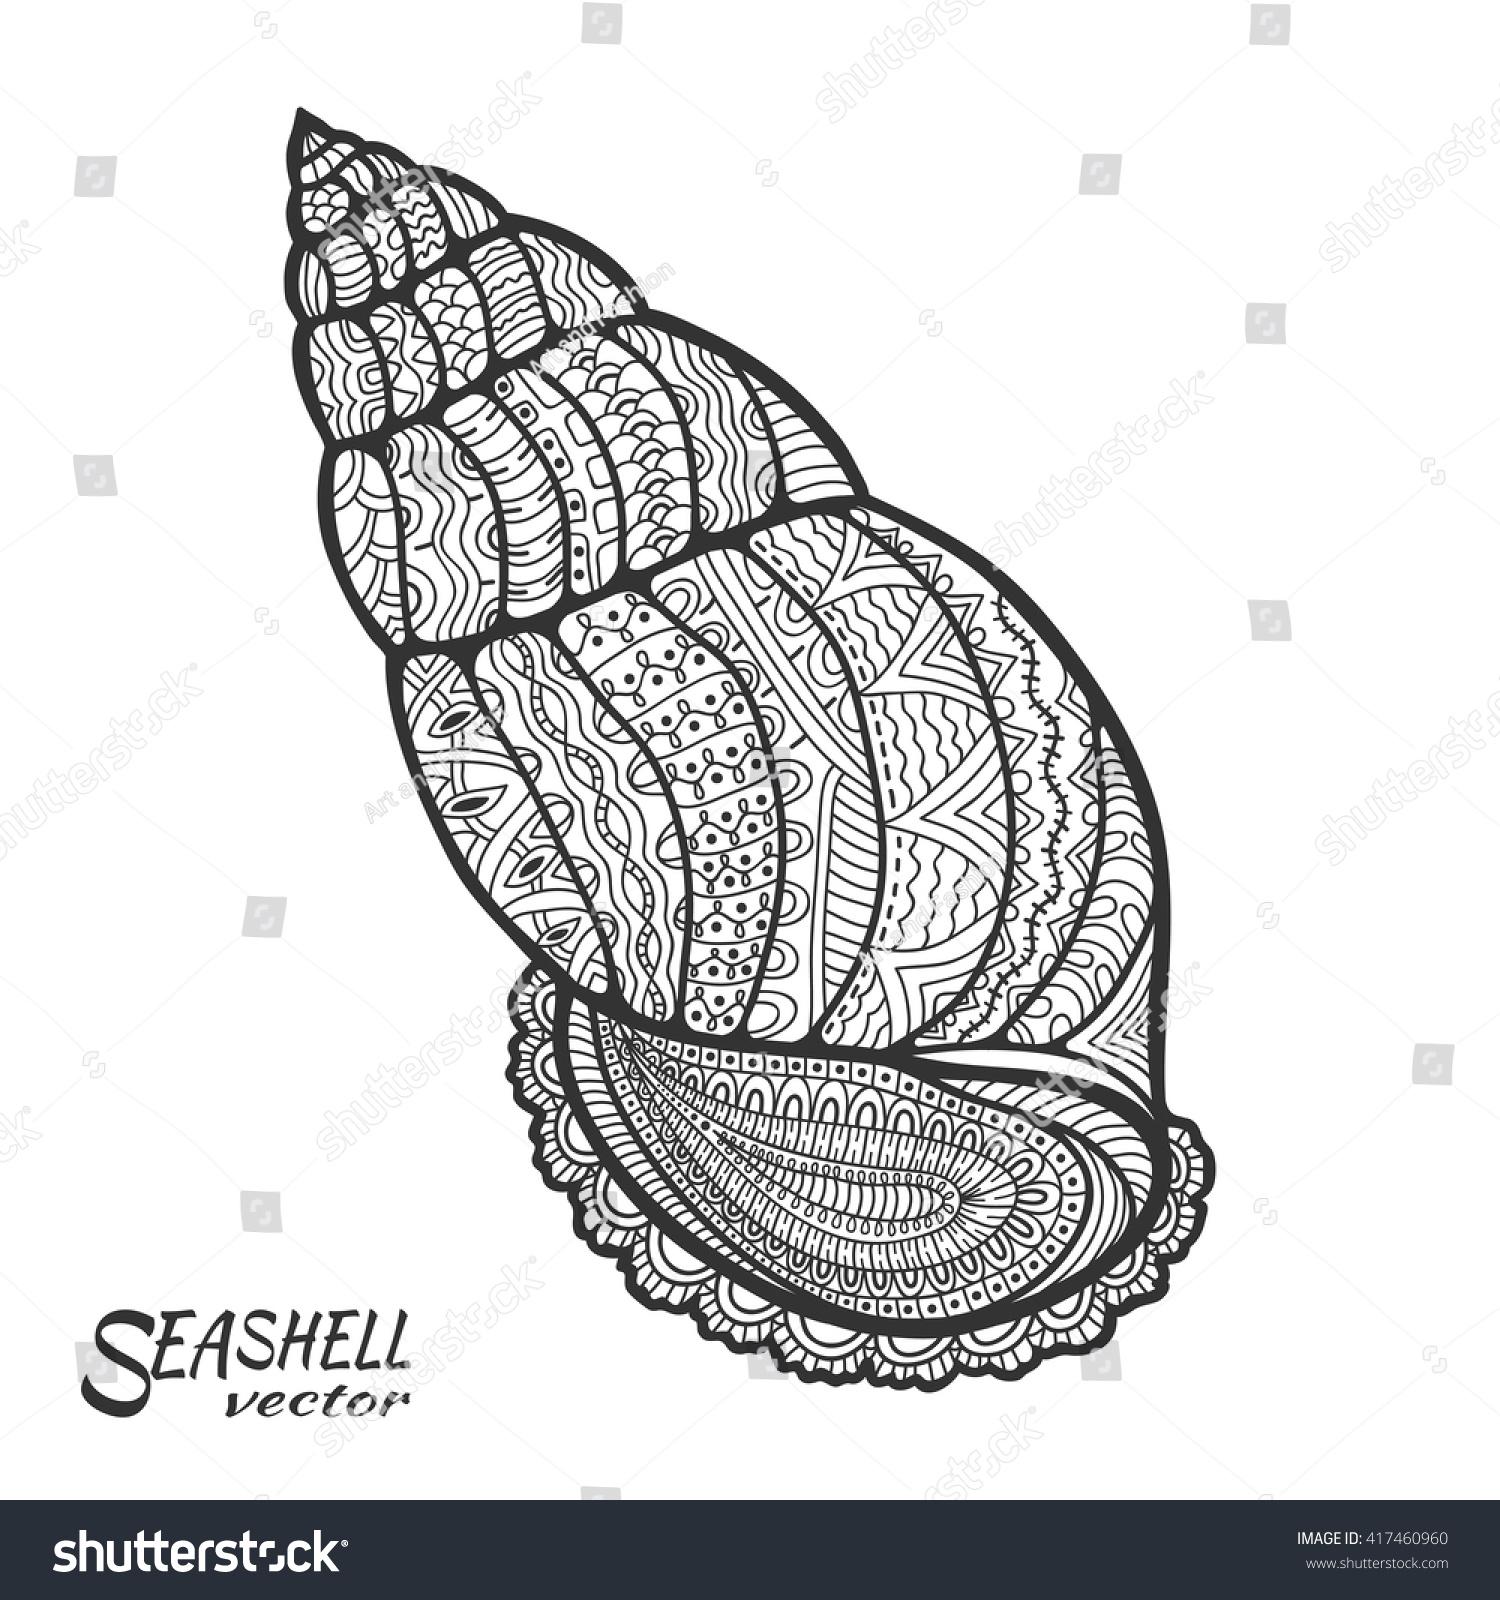 Zen ocean colouring book - Zentangle Stylized Seashell Hand Drawn Doodle Sea Shell Pattern Marine Ocean Life Coloring